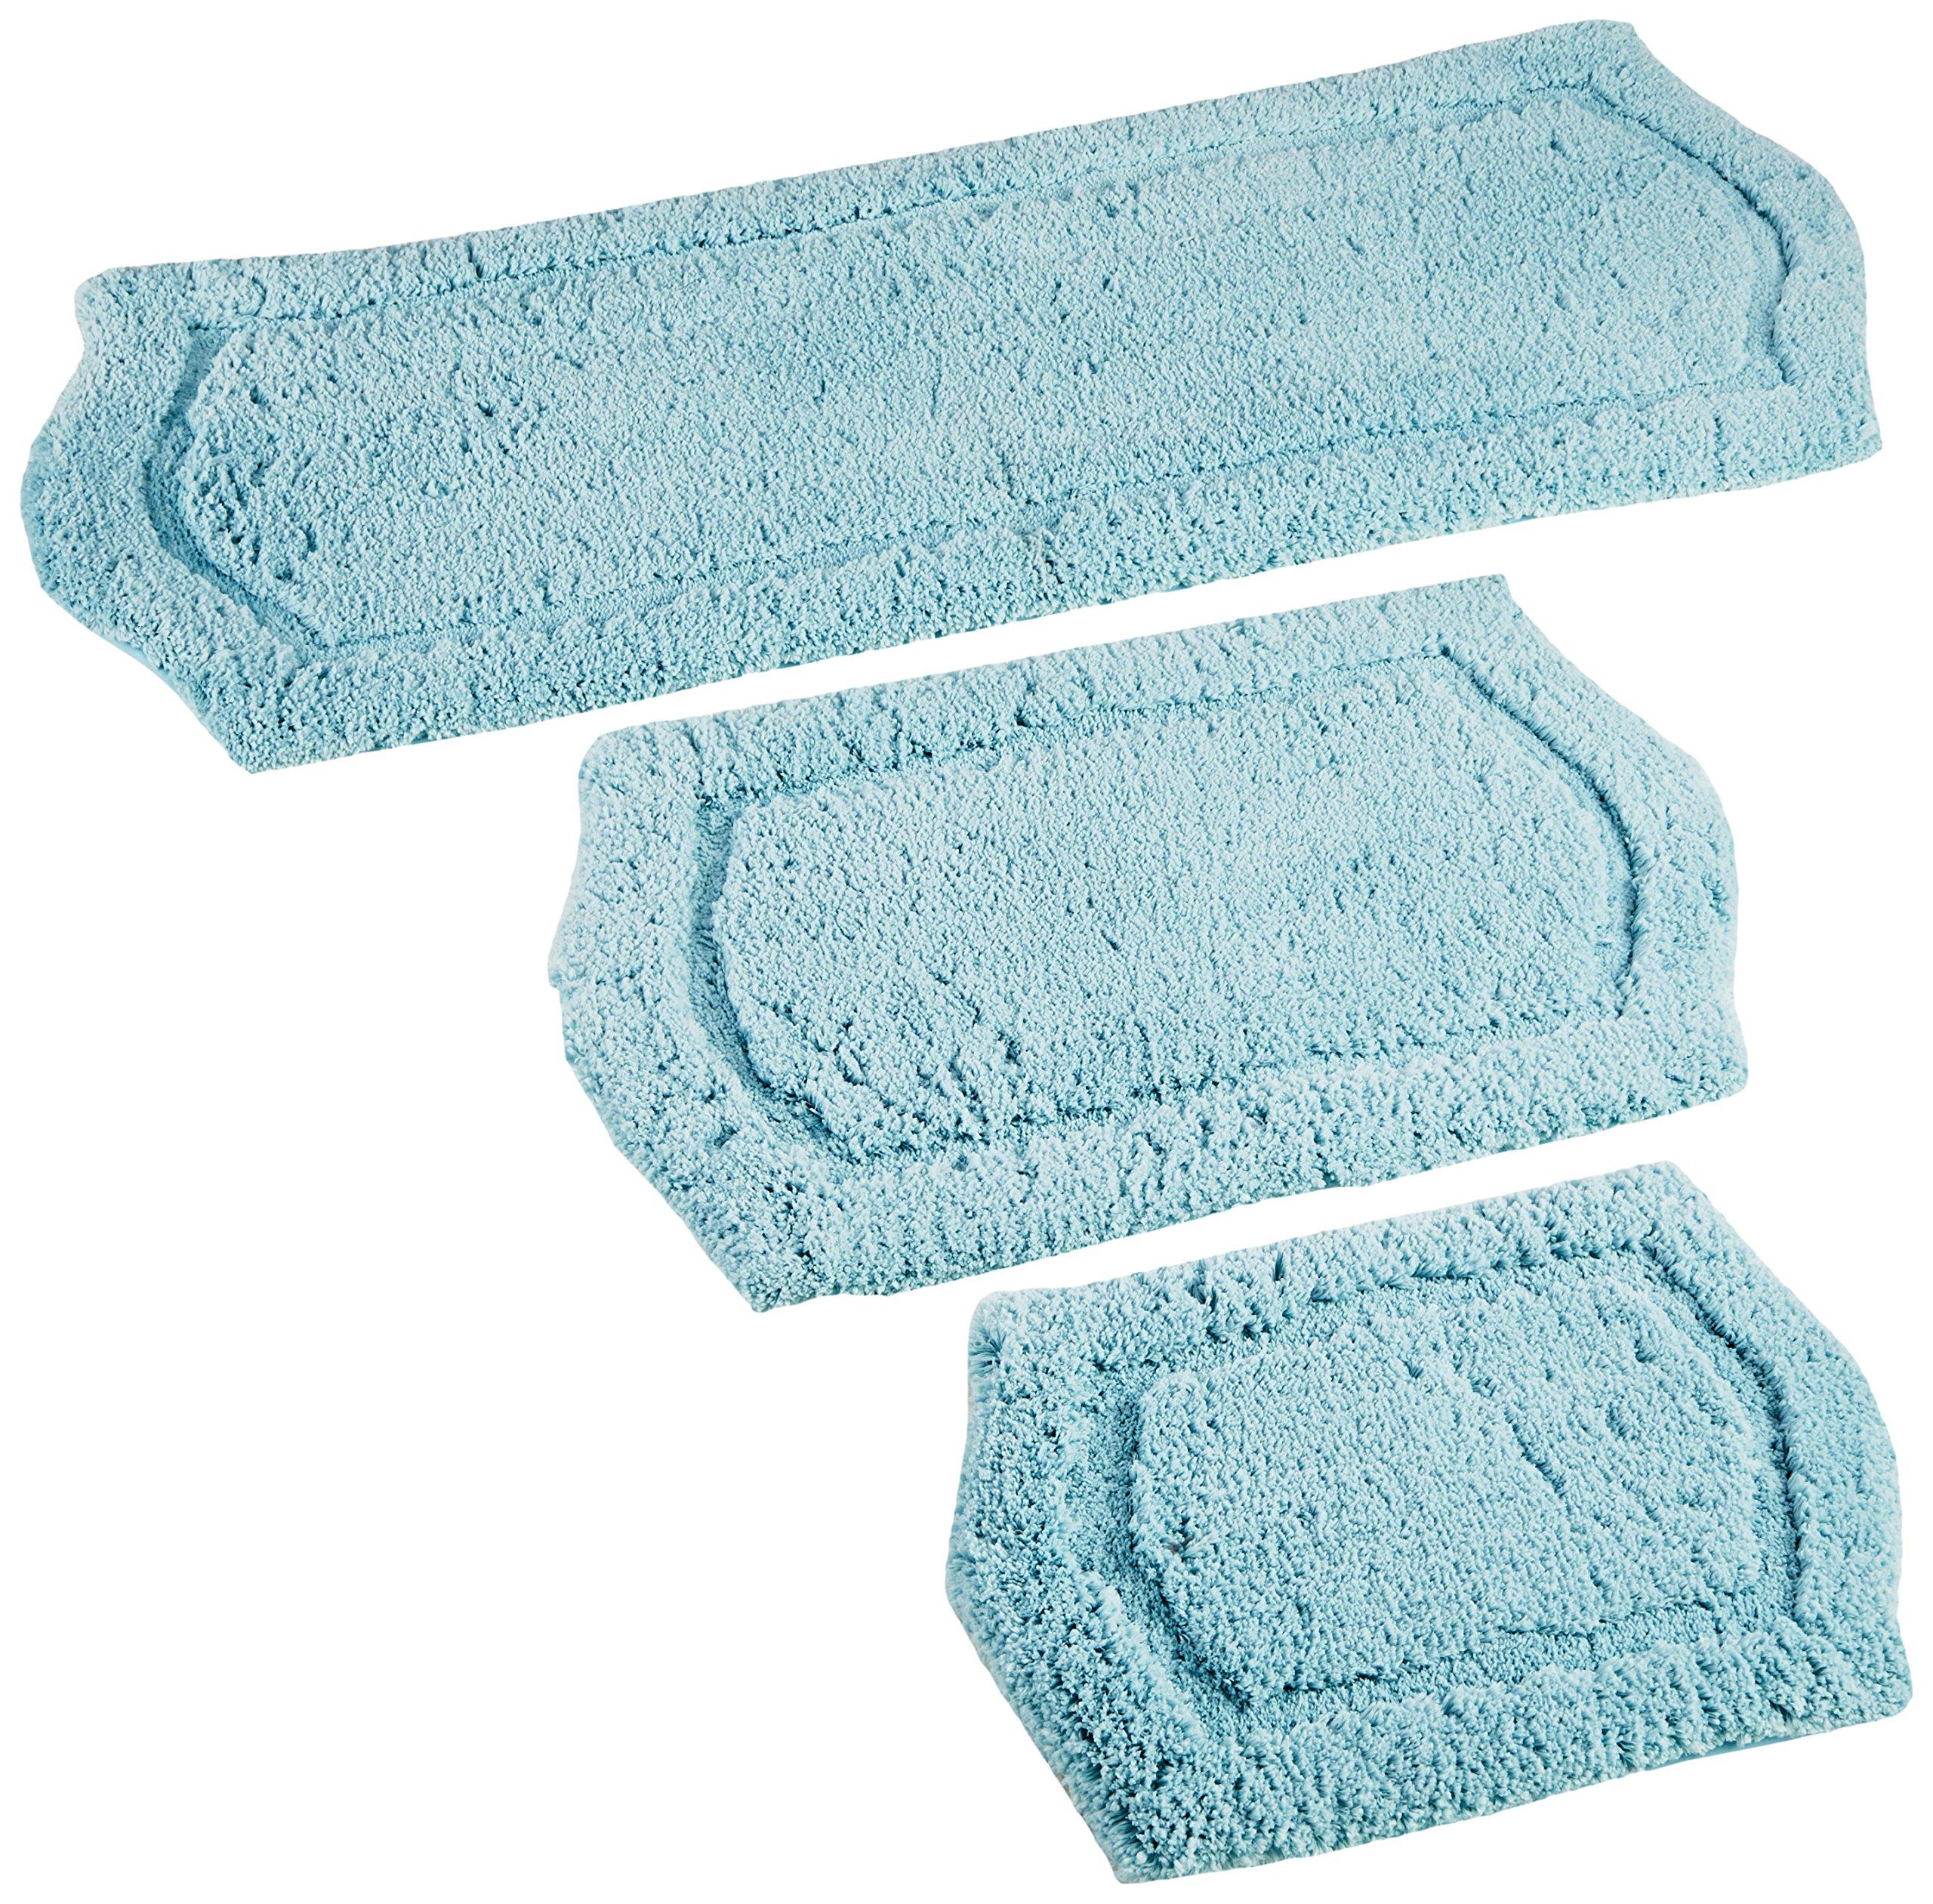 Chesapeake Merchandising 3-Piece Paradise Memory Foam Bath Rug Set, Spa Blue